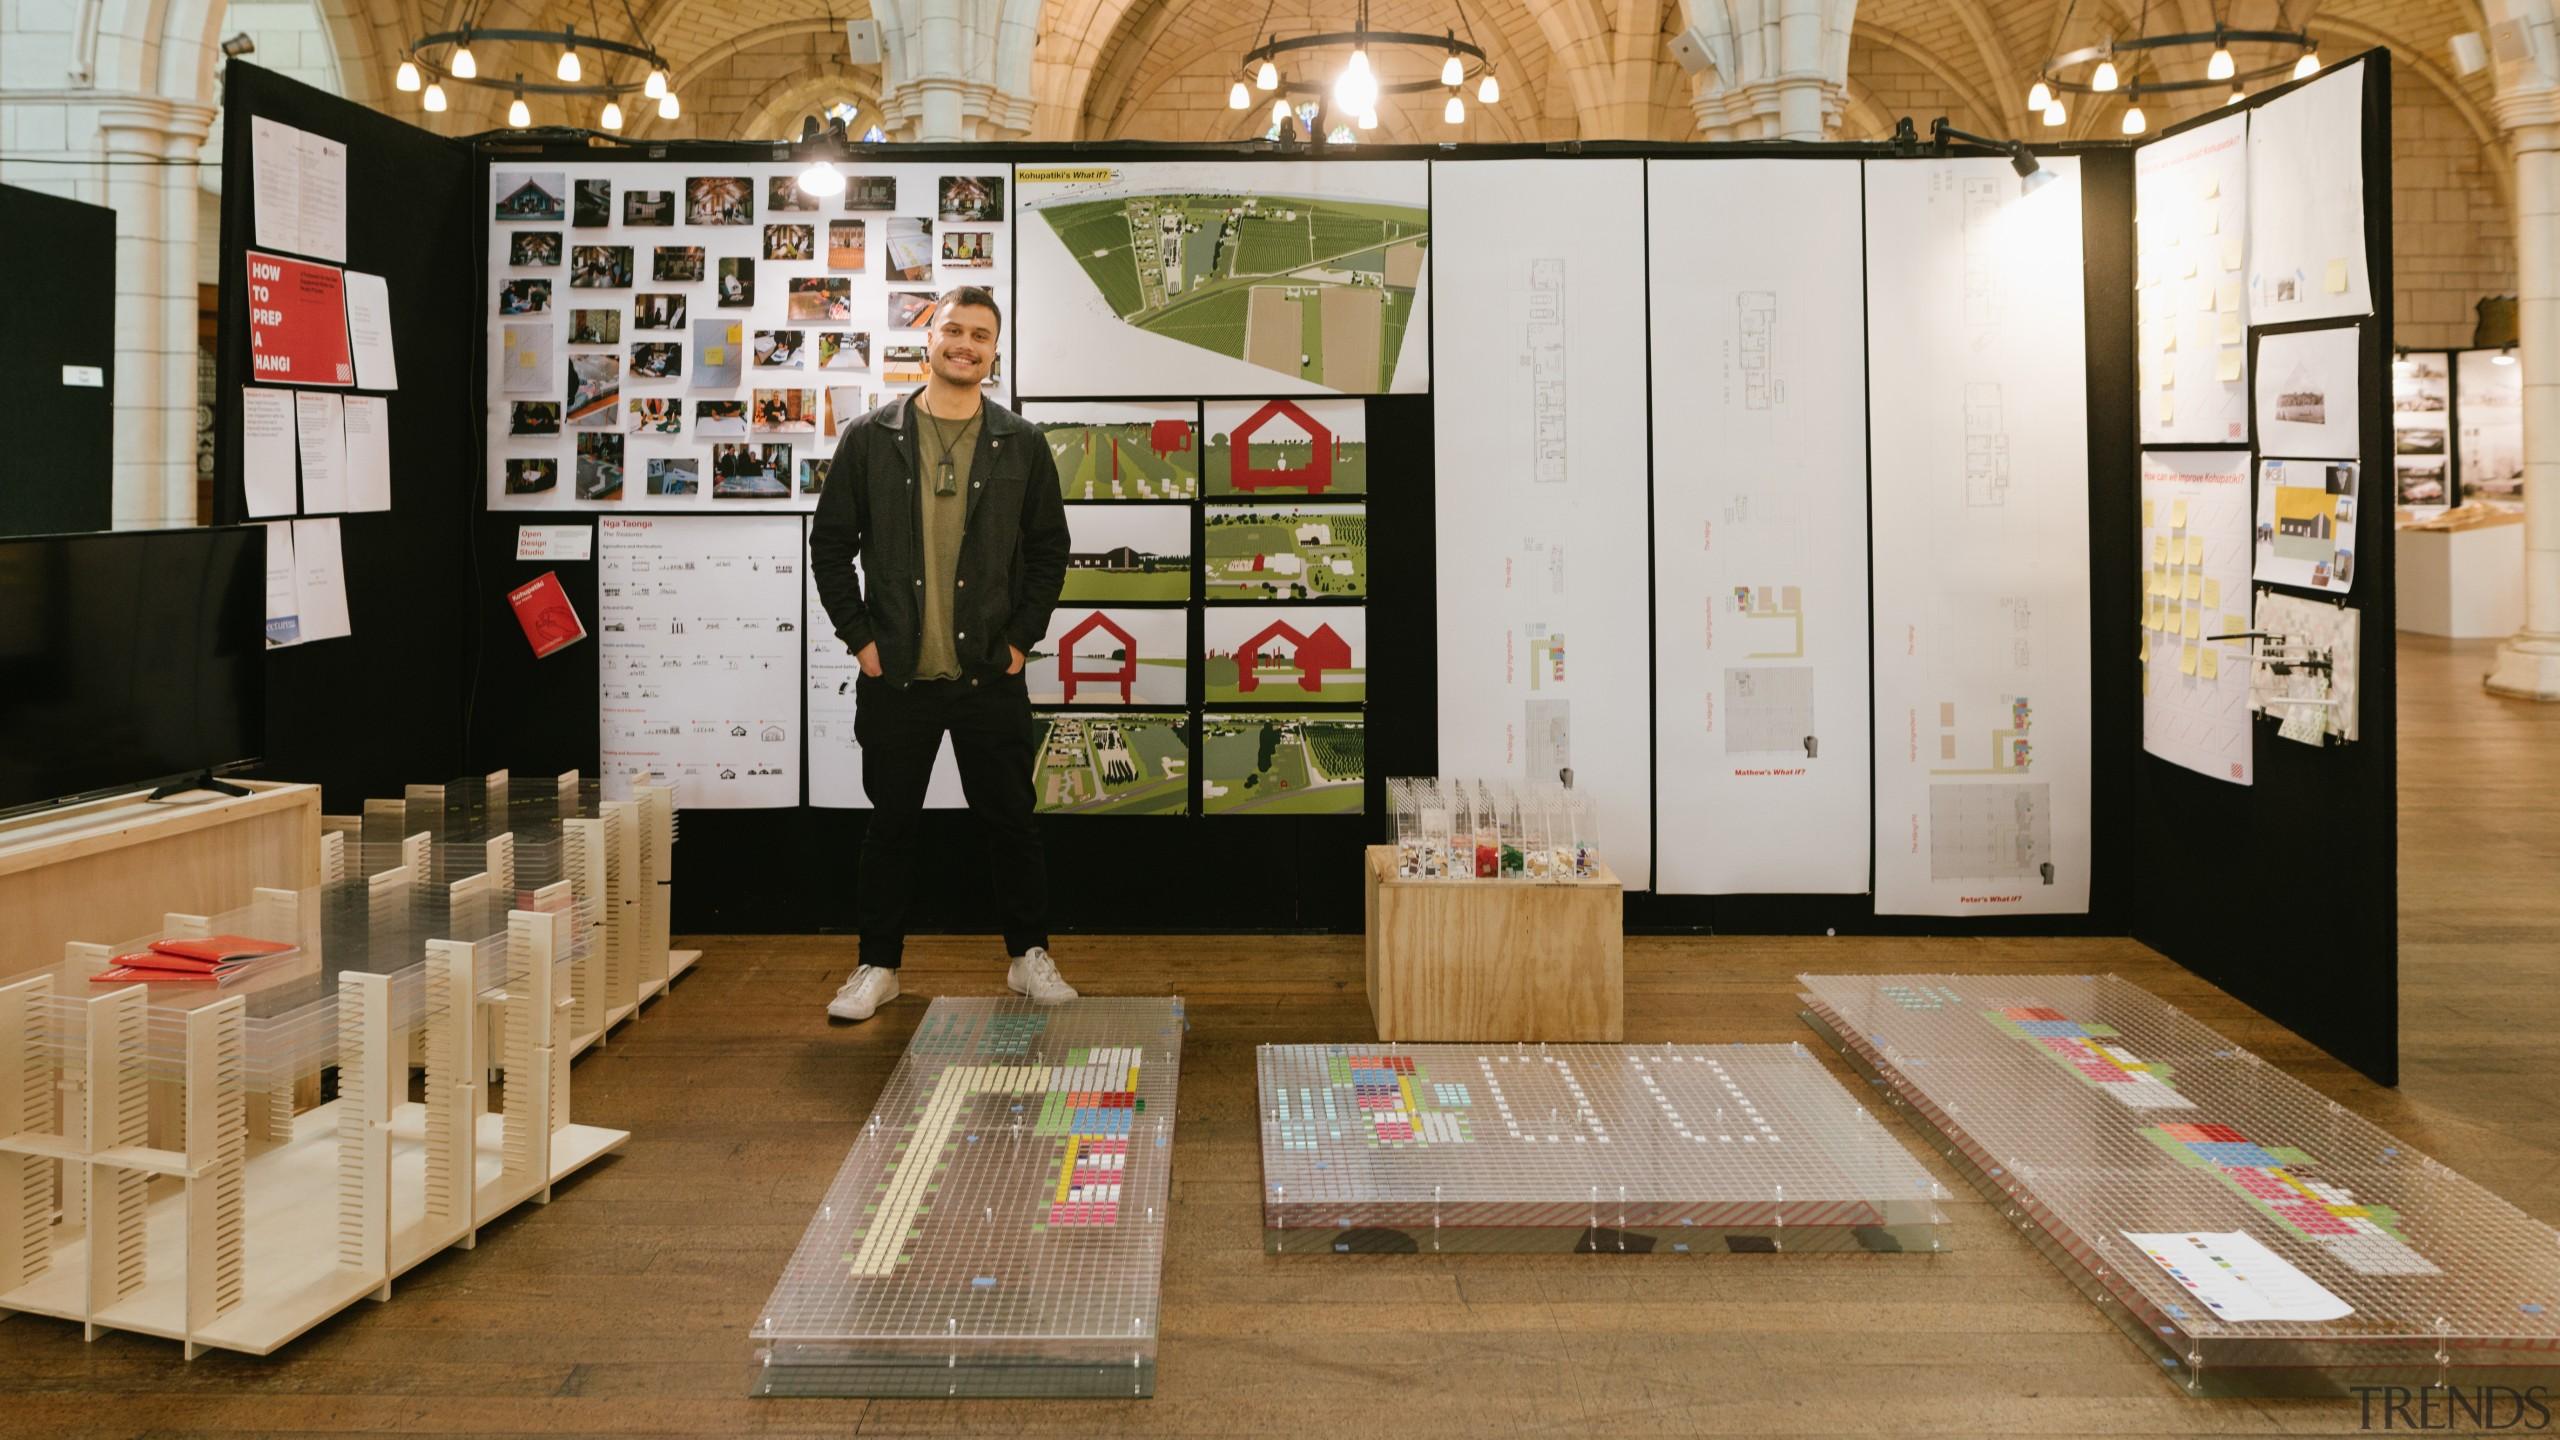 Jahmayne Robin Middleton – Victoria University Of Wellington design, exhibition, flooring, furniture, interior design, brown, gray